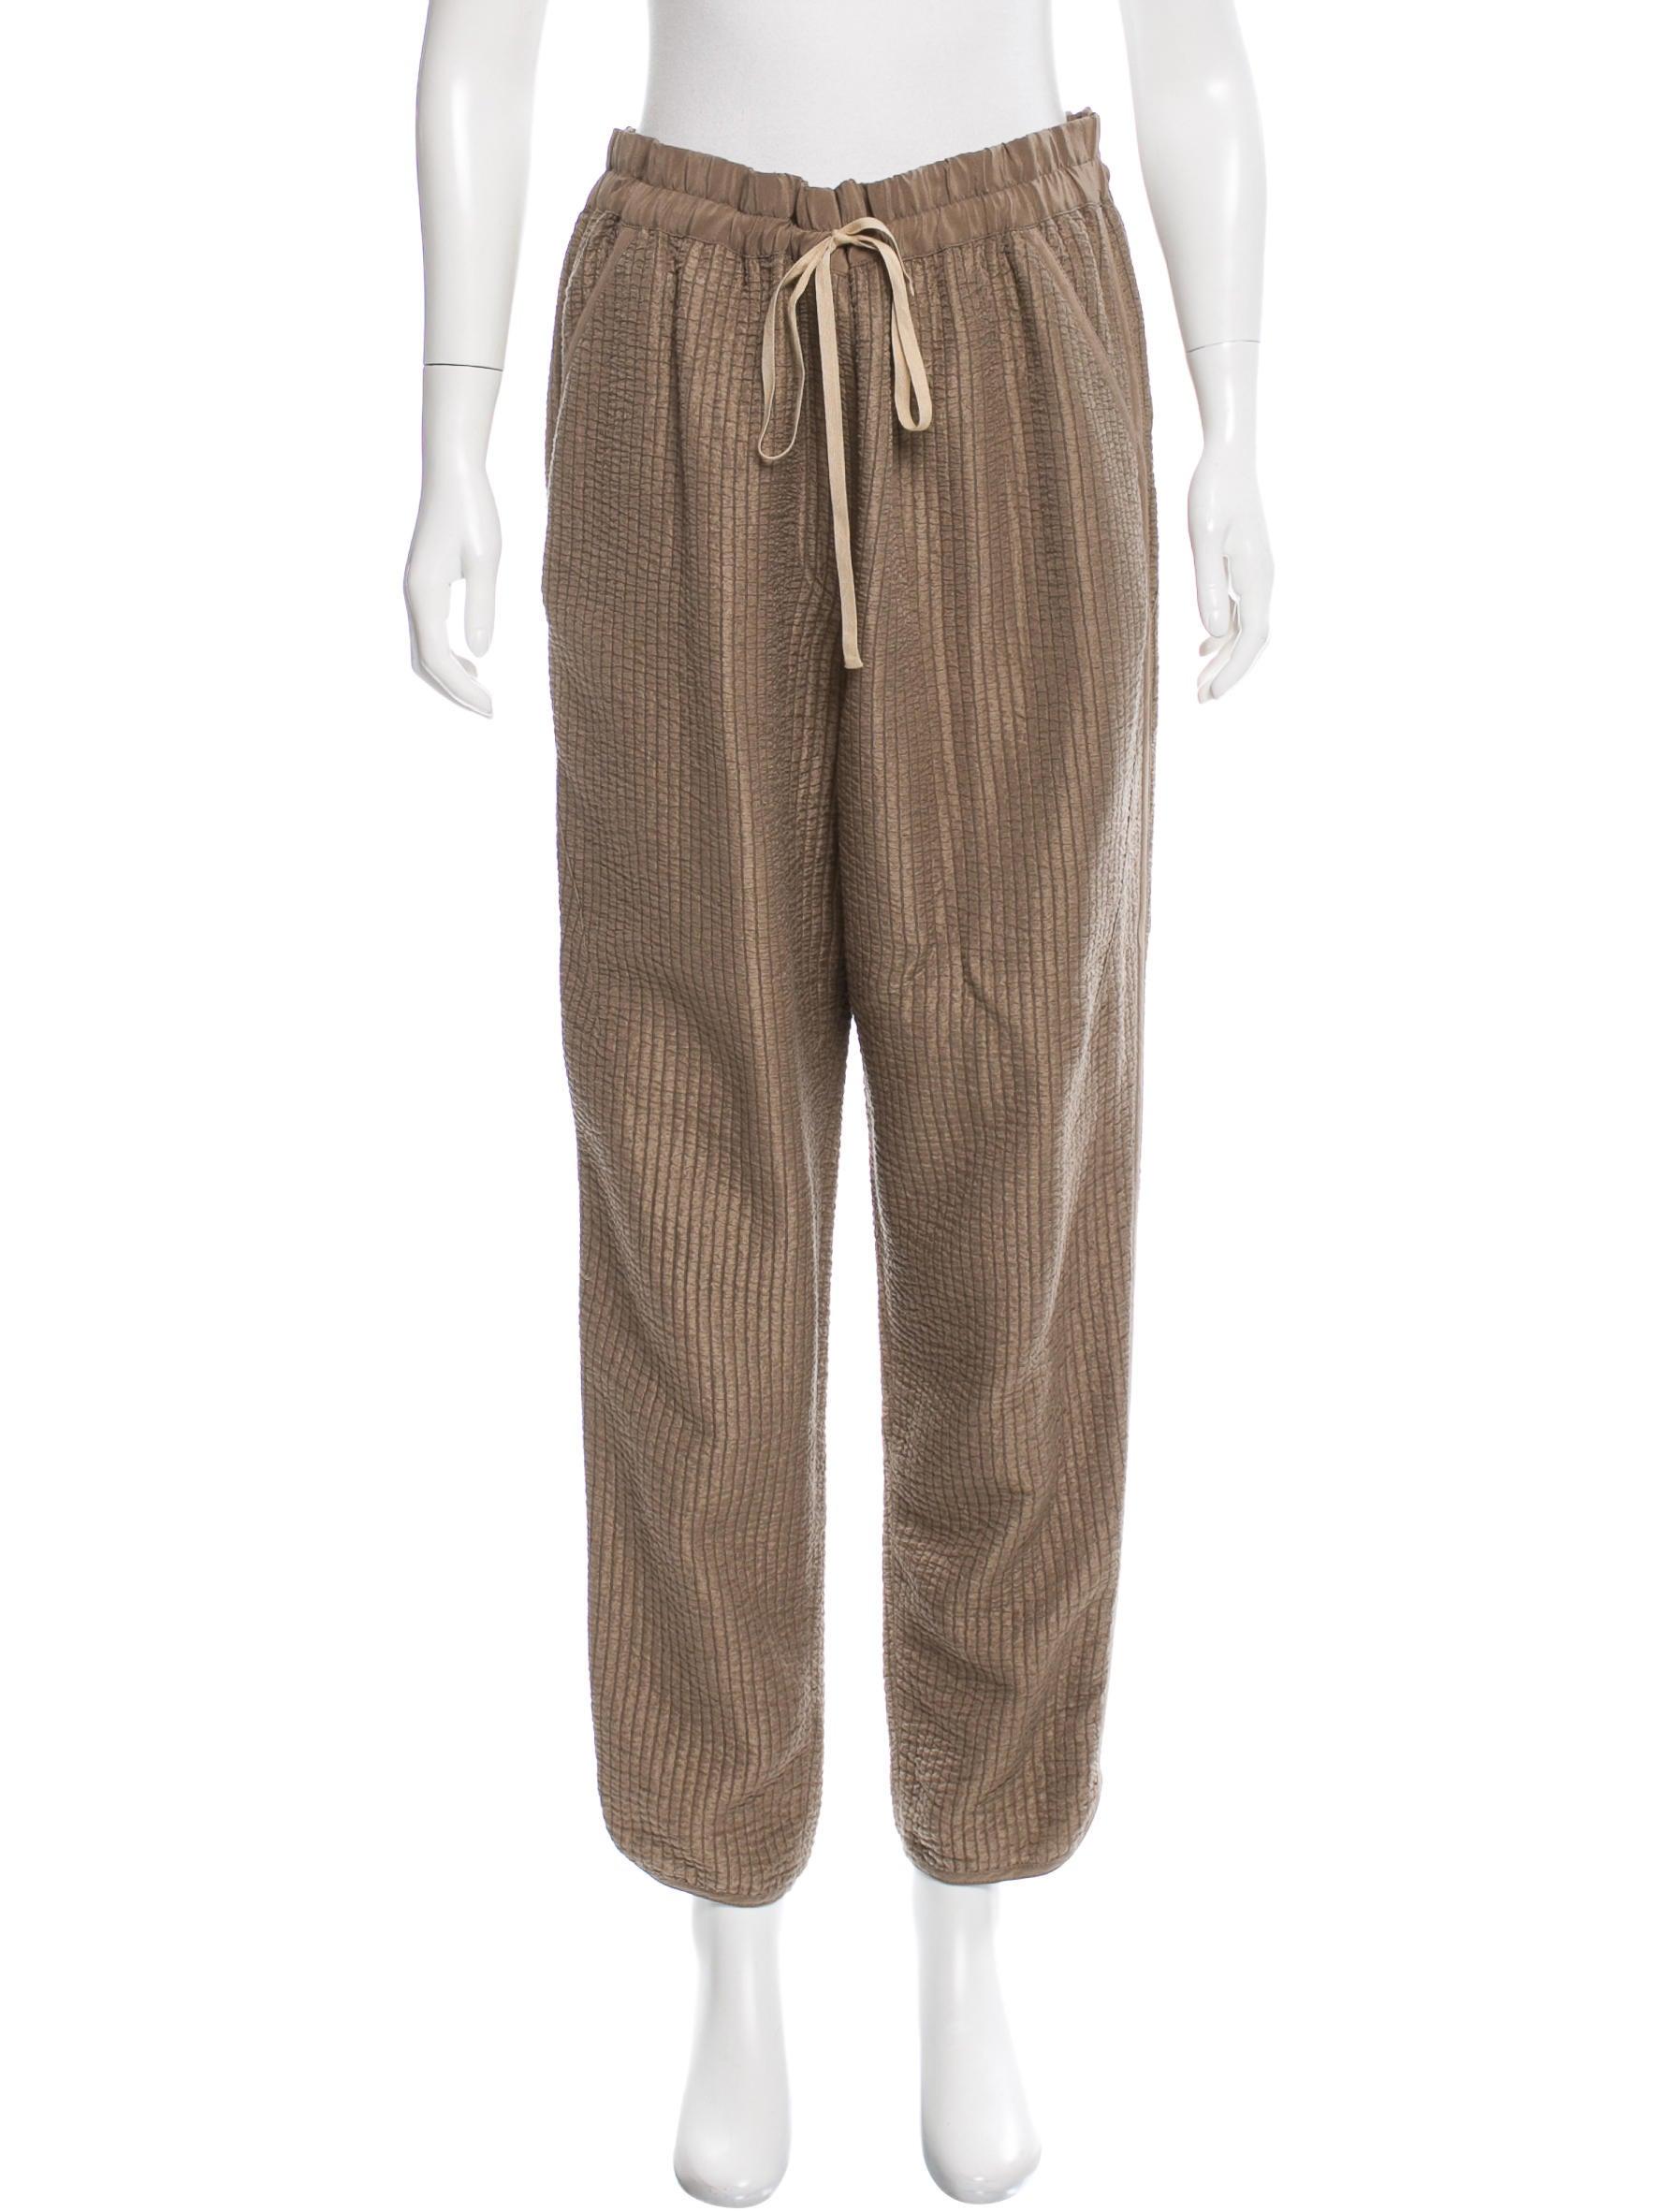 3 1 phillip lim silk wool clothing w31ph43677